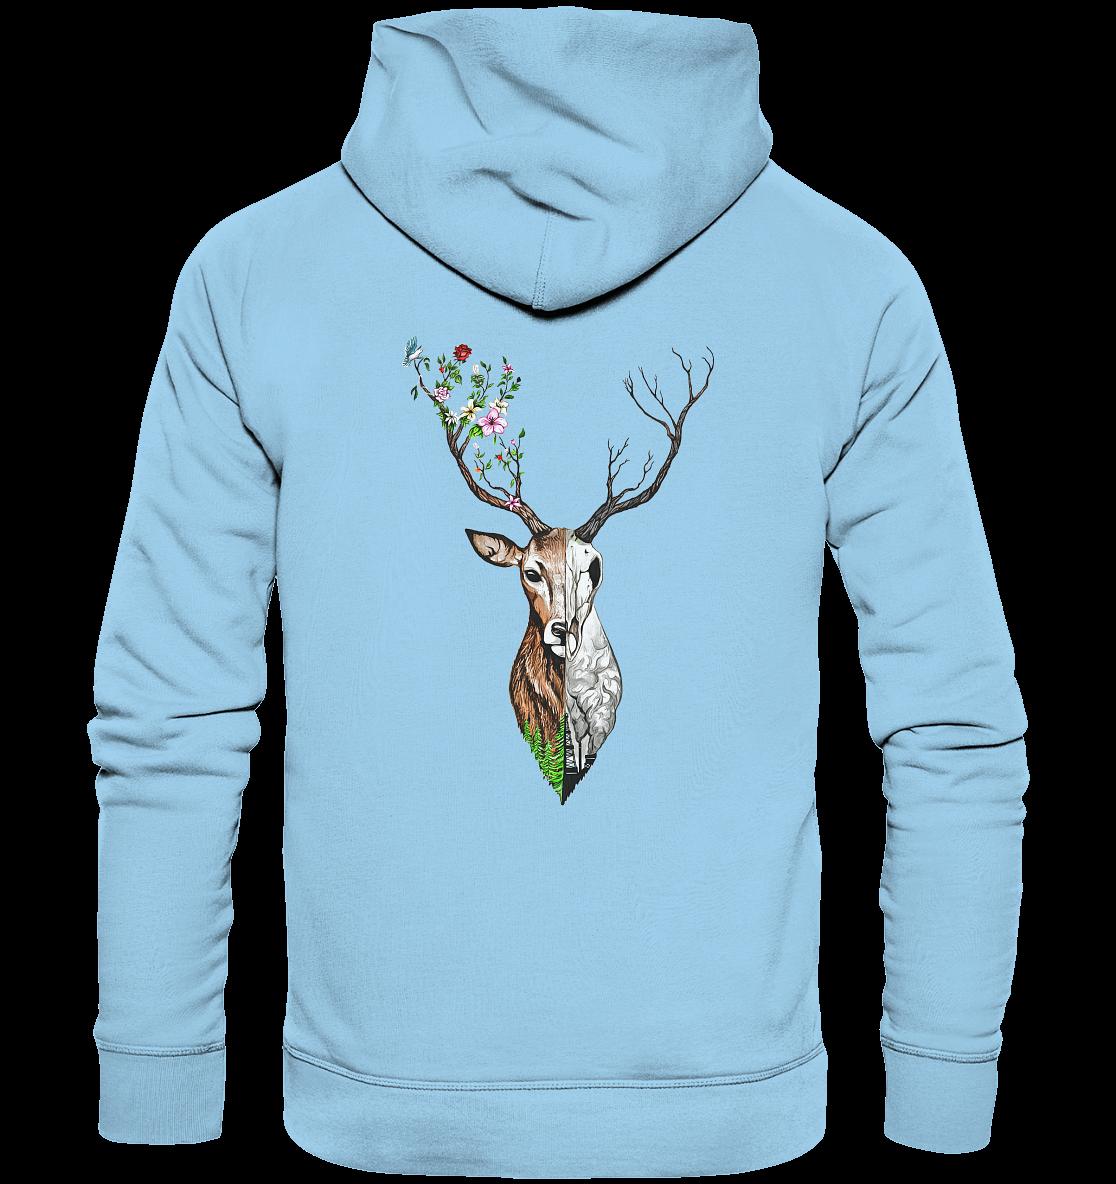 back-organic-hoodie-9fd0ed-1116x.png